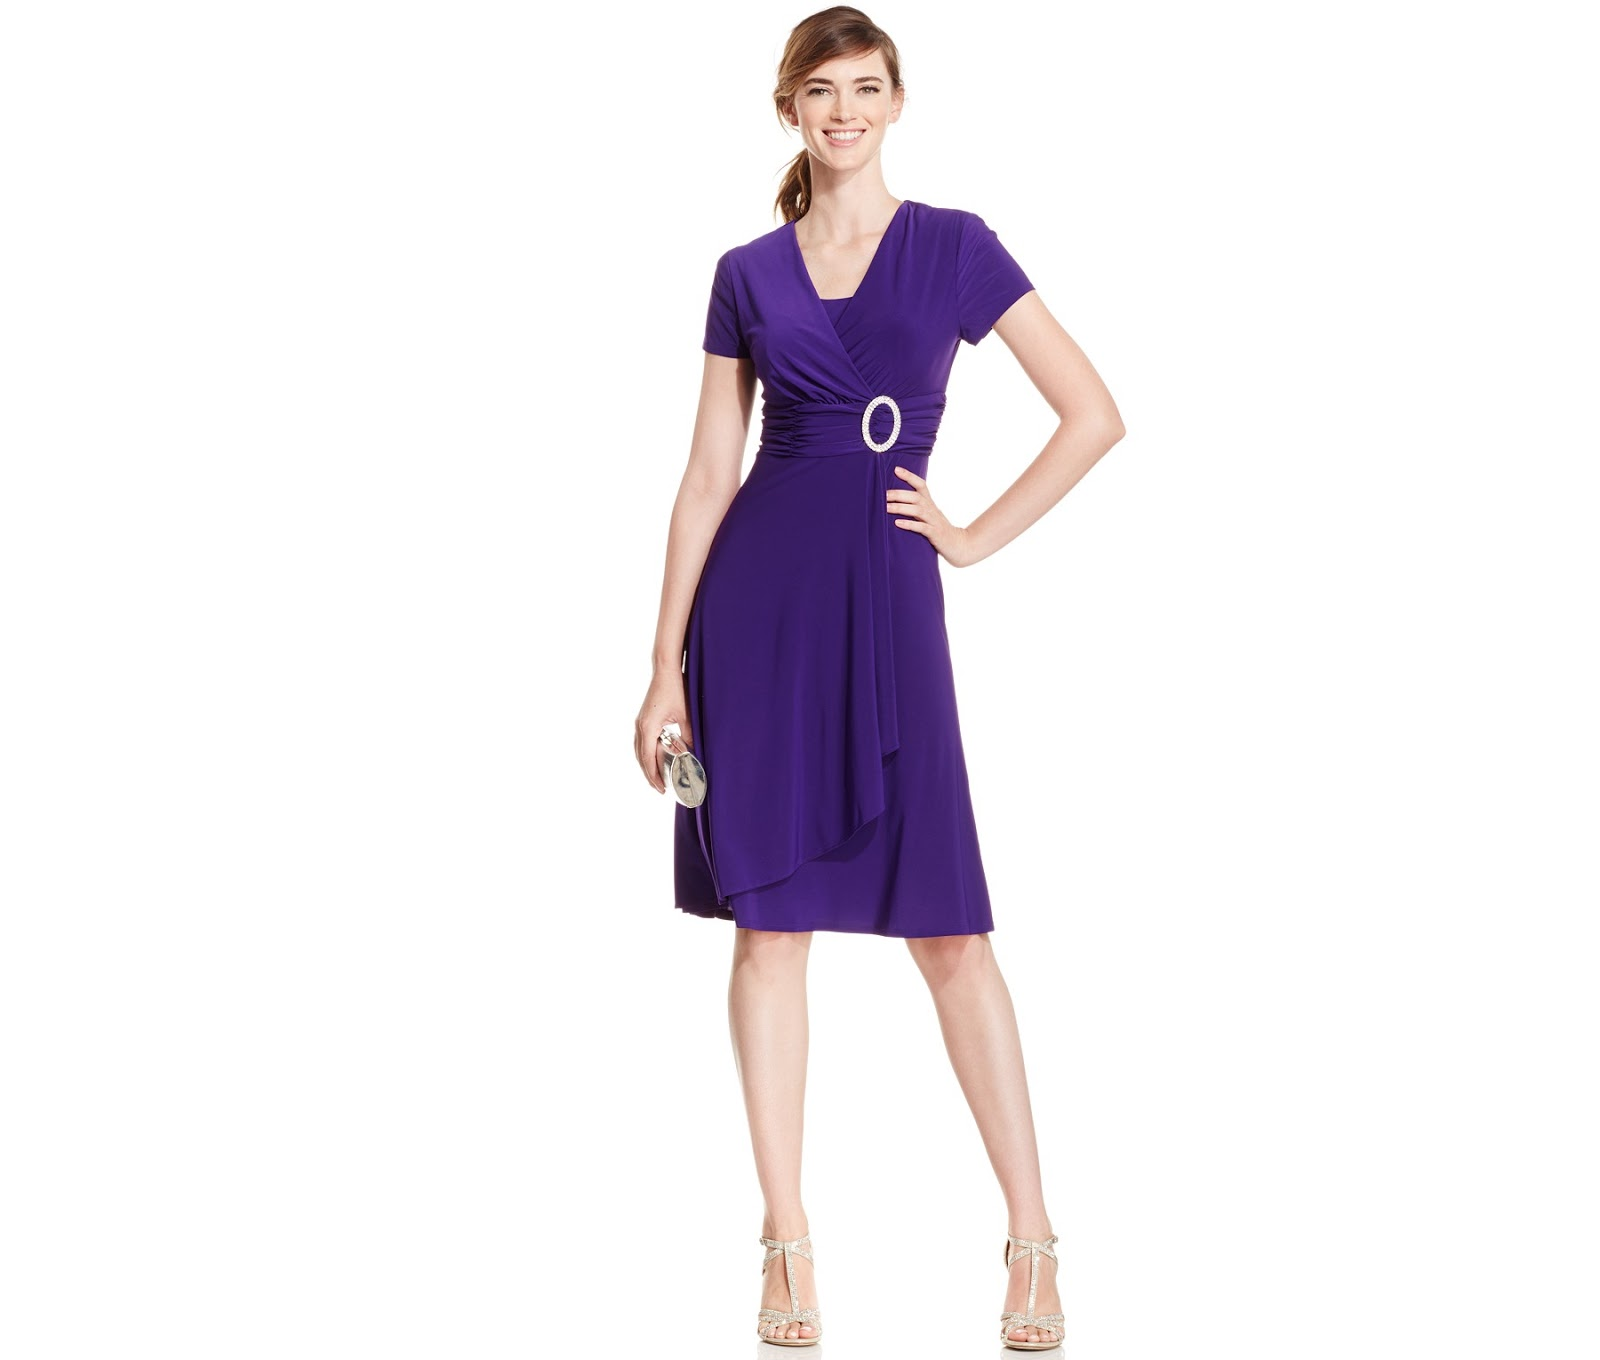 Vestidos de Coctel 2017 ¡Espectaculares Modelos! | Vestidos | Moda ...